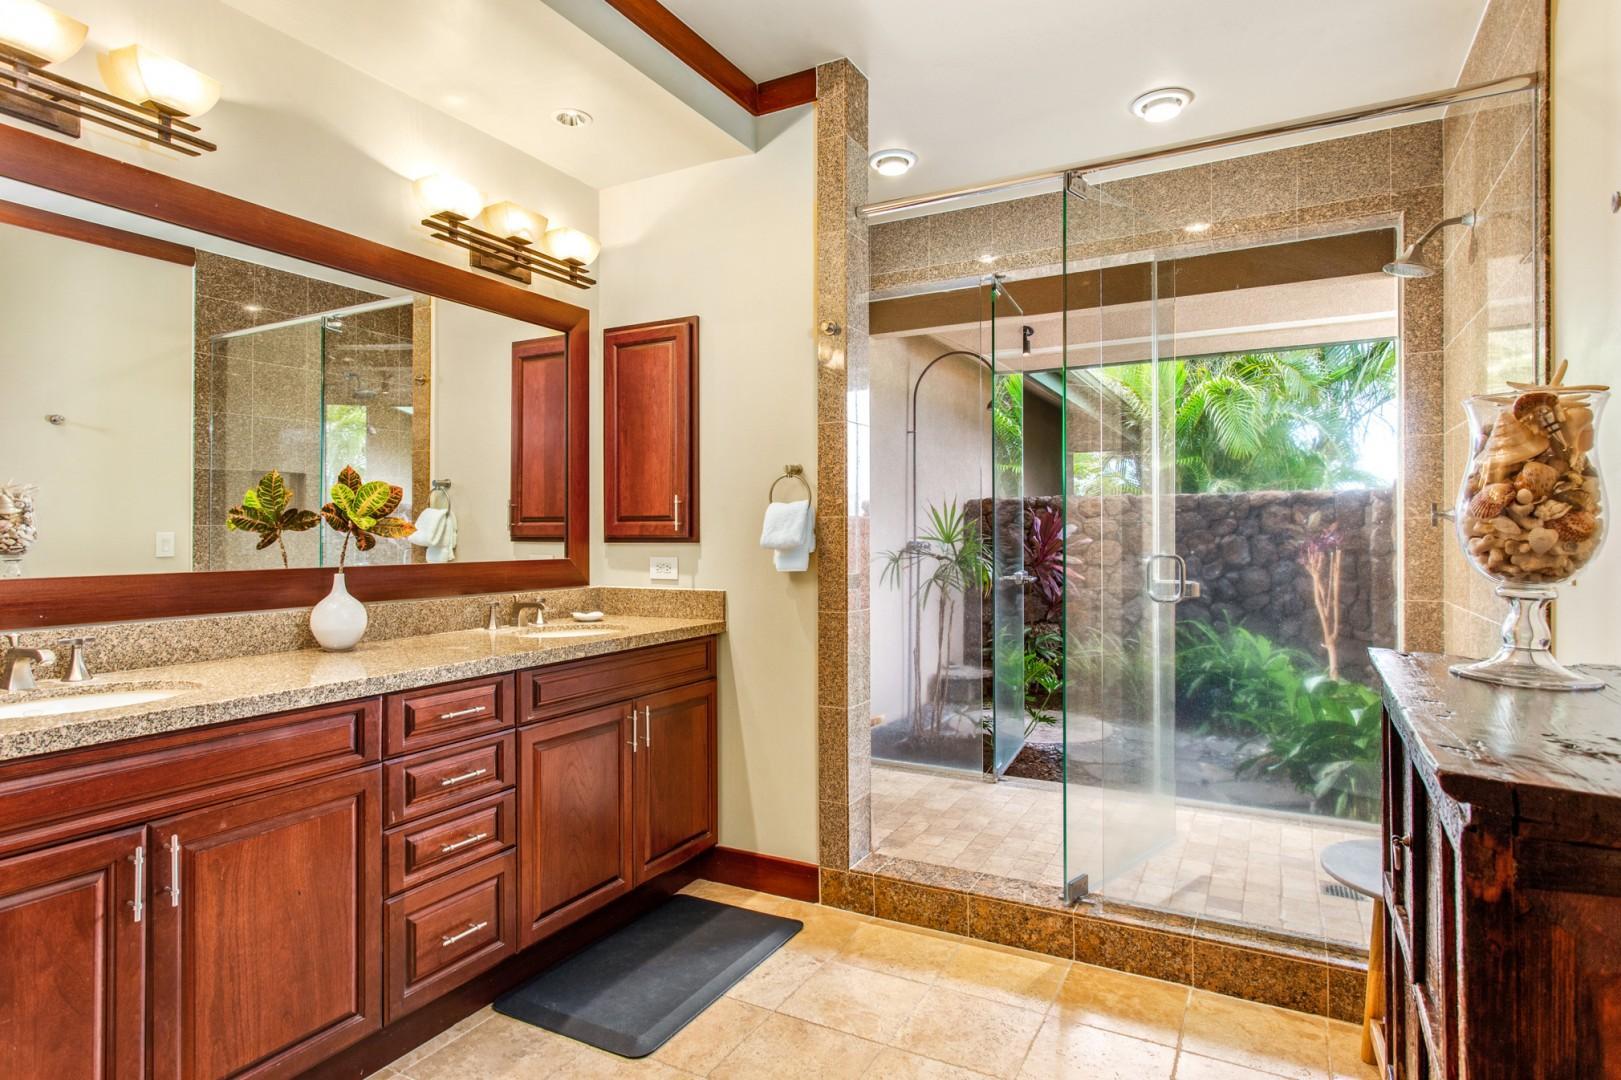 Master bath #1 with dual vanities, glass enclosed indoor shower + outdoor shower garden, a tropical treat!